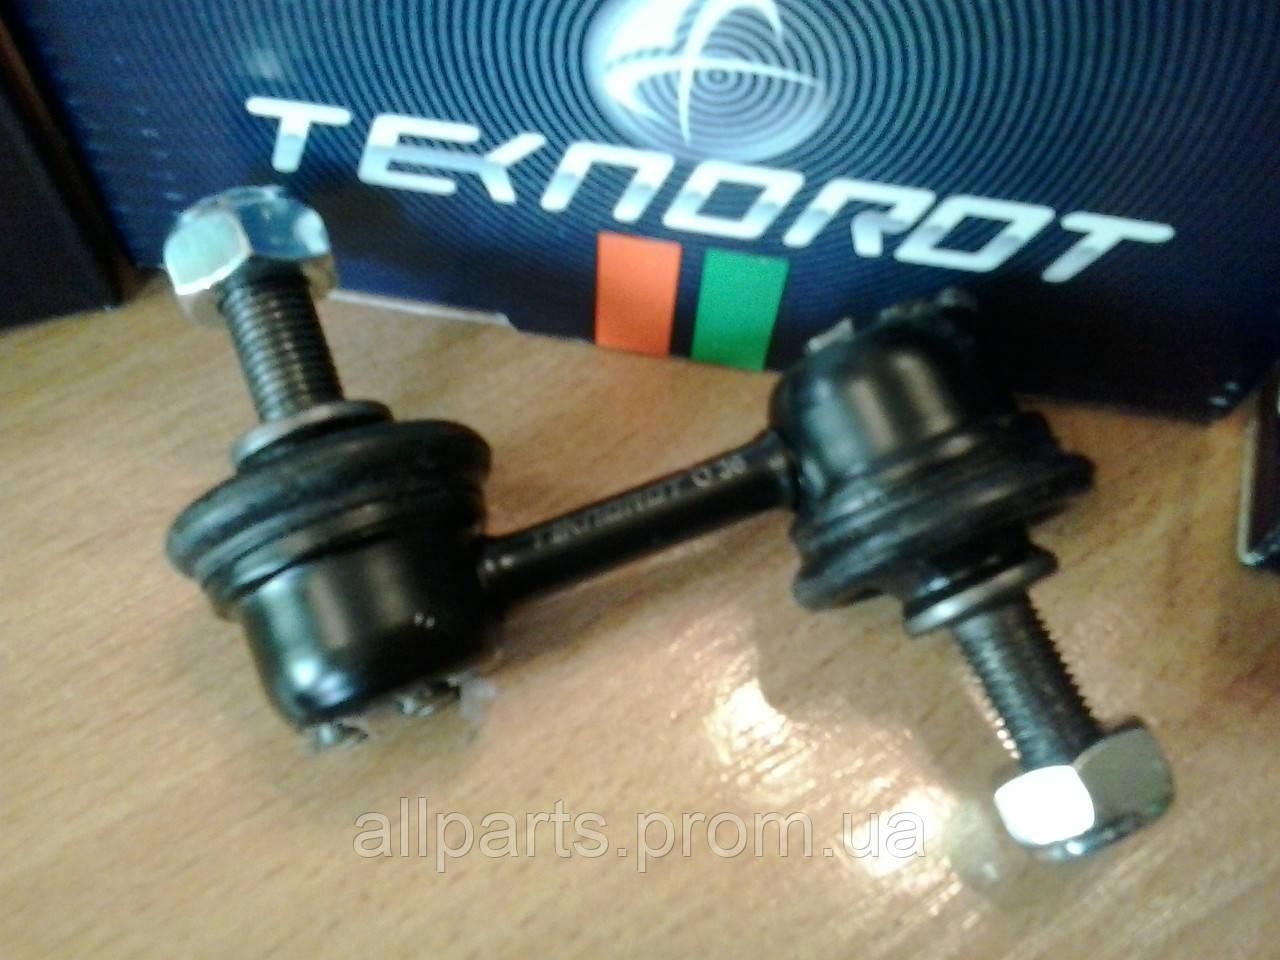 Teknorot (страна производитель Турция) - отзывы о запчастях подвески Технорот